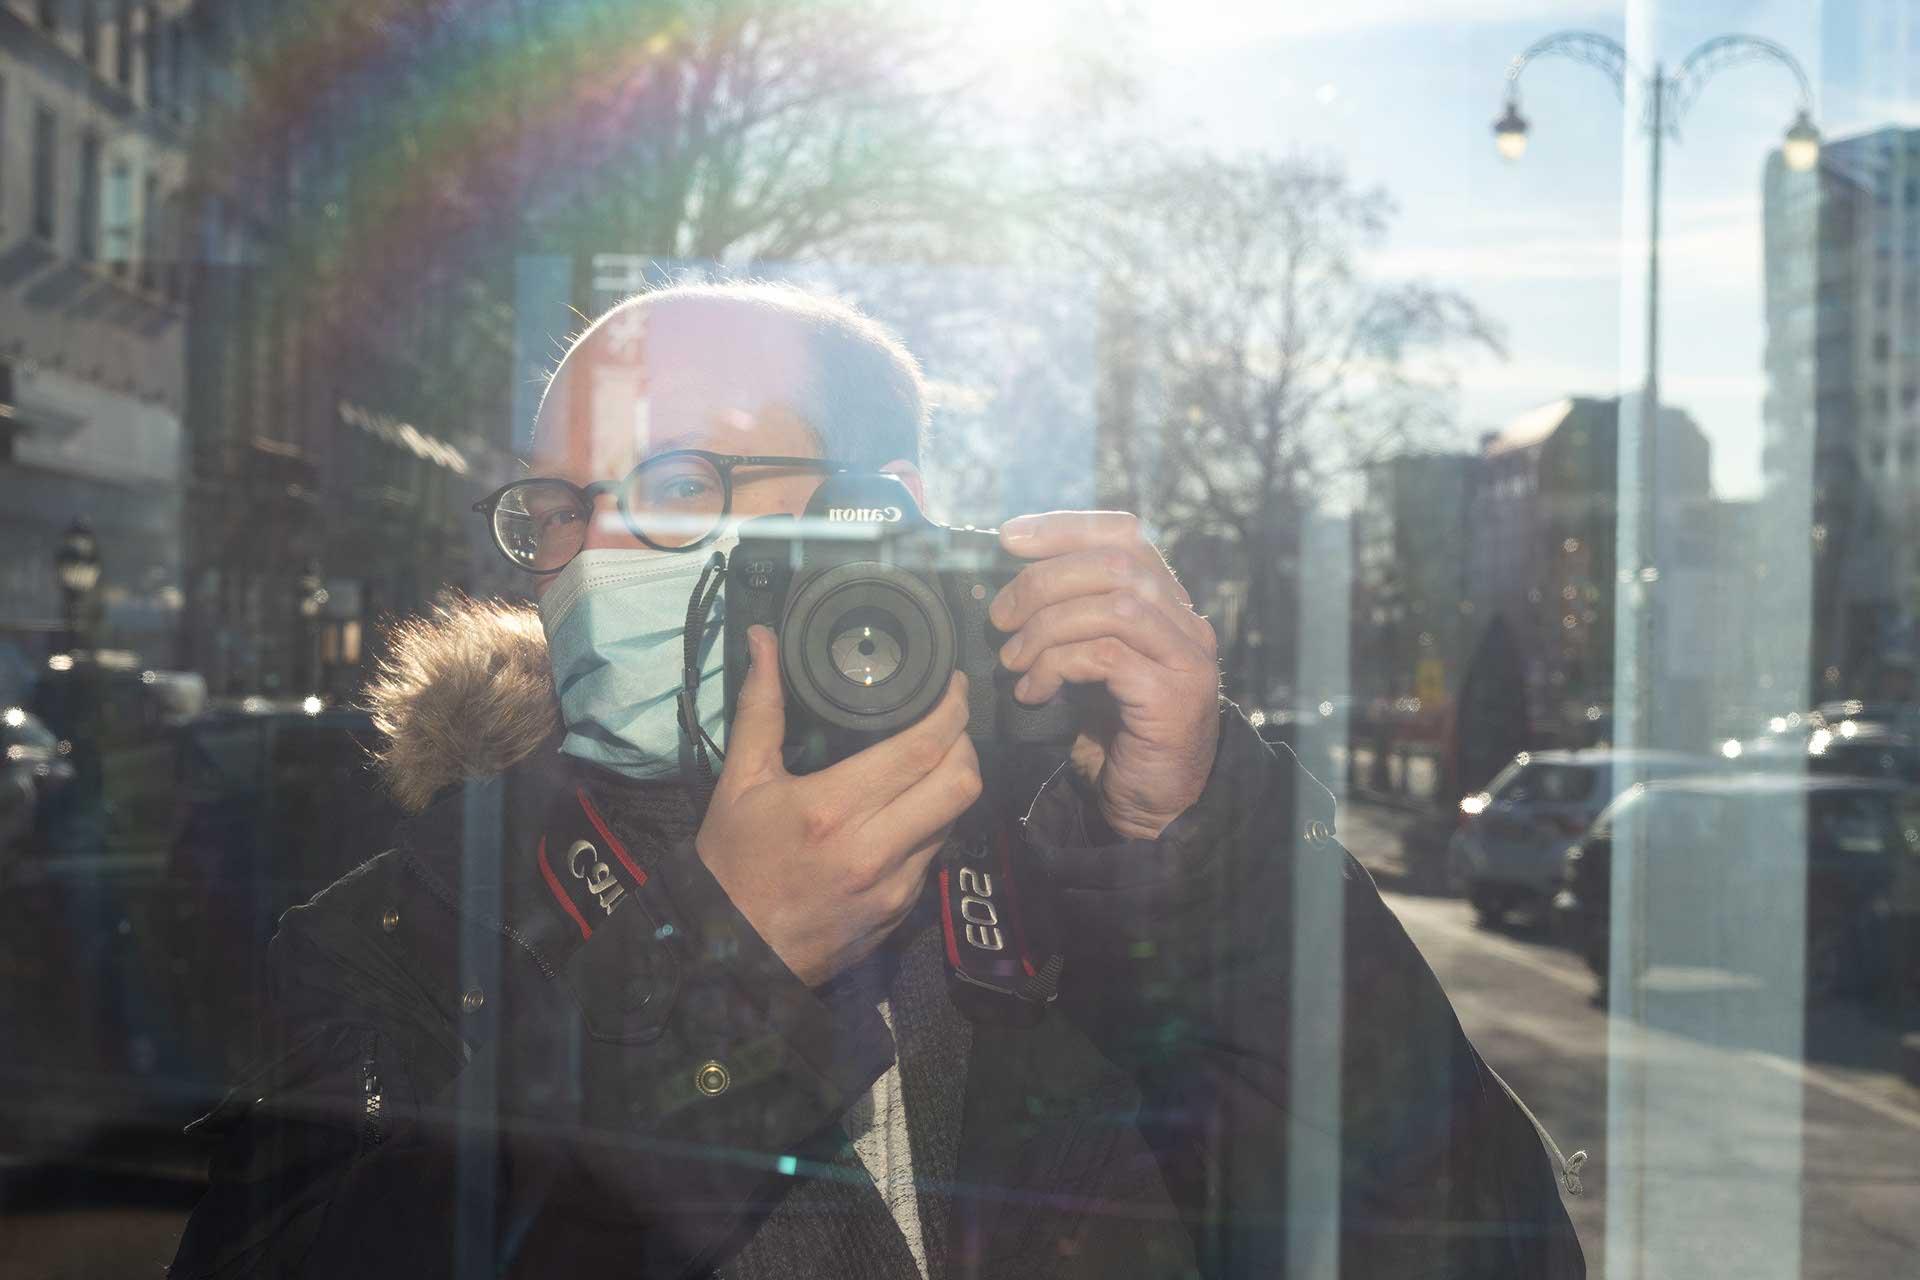 Self portrait (photo: Jochem Oomen)